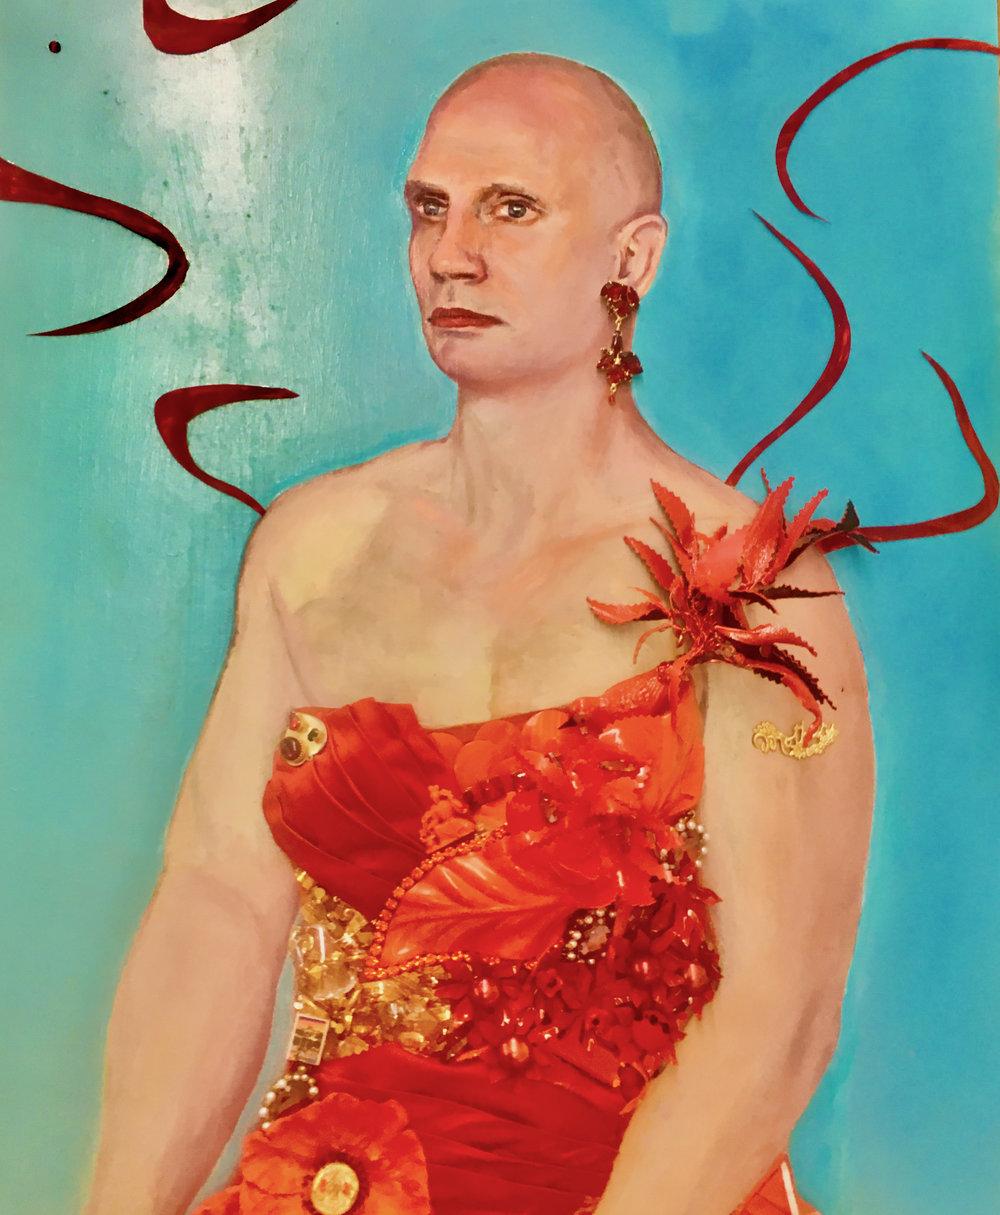 StrosbergMandel-TheMasseur-Enamel paint and mixed media-24 x 30 in.-$9,990.jpg